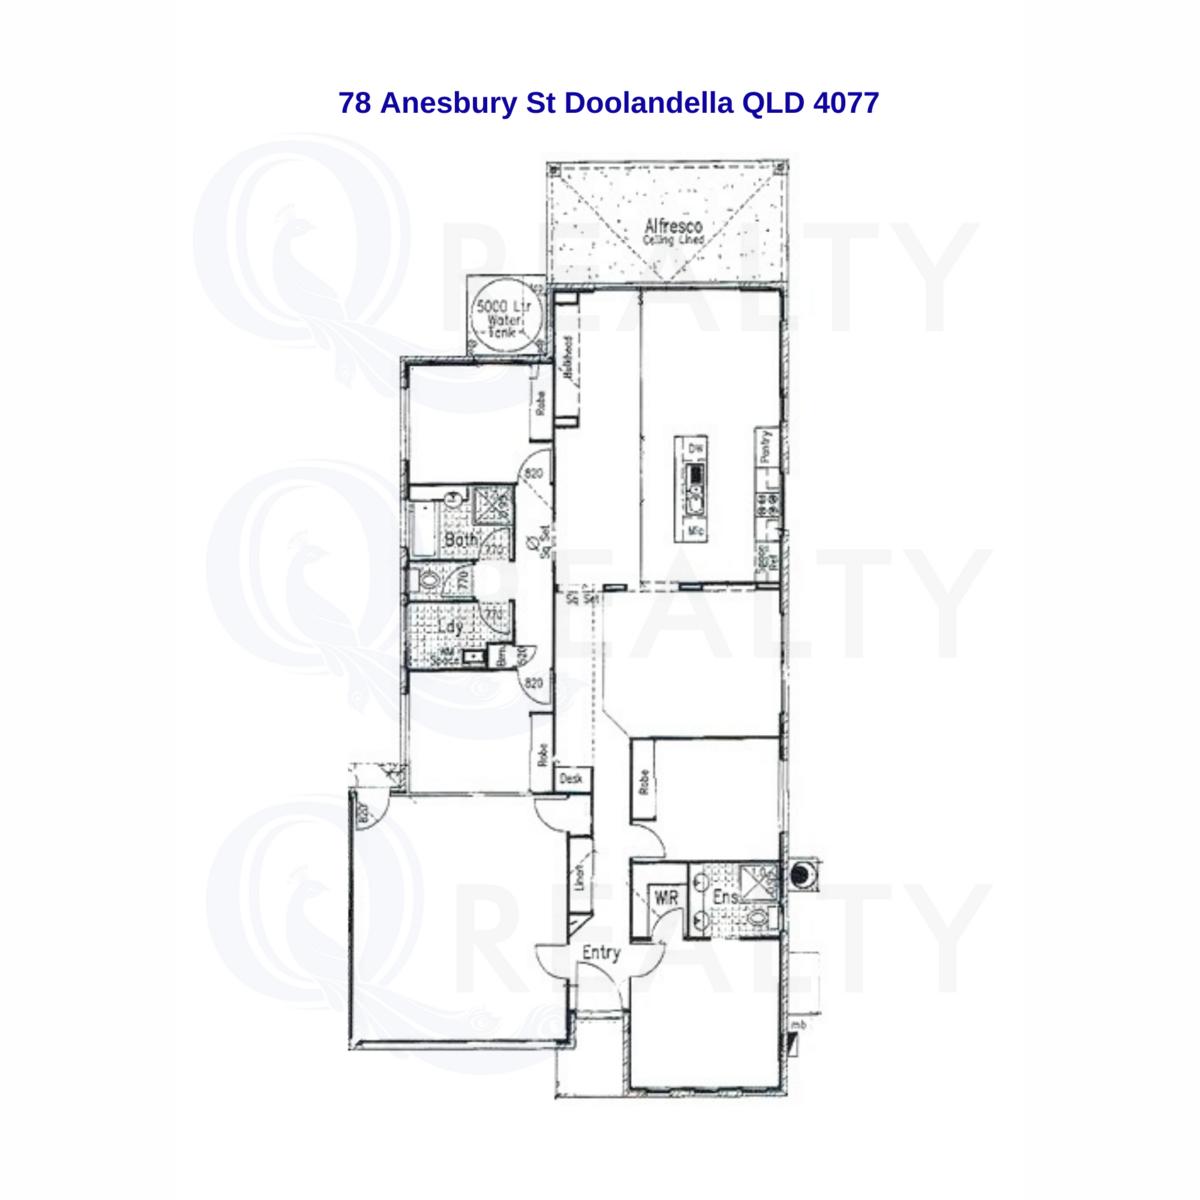 78 Anesbury Street, Doolandella  QLD  4077